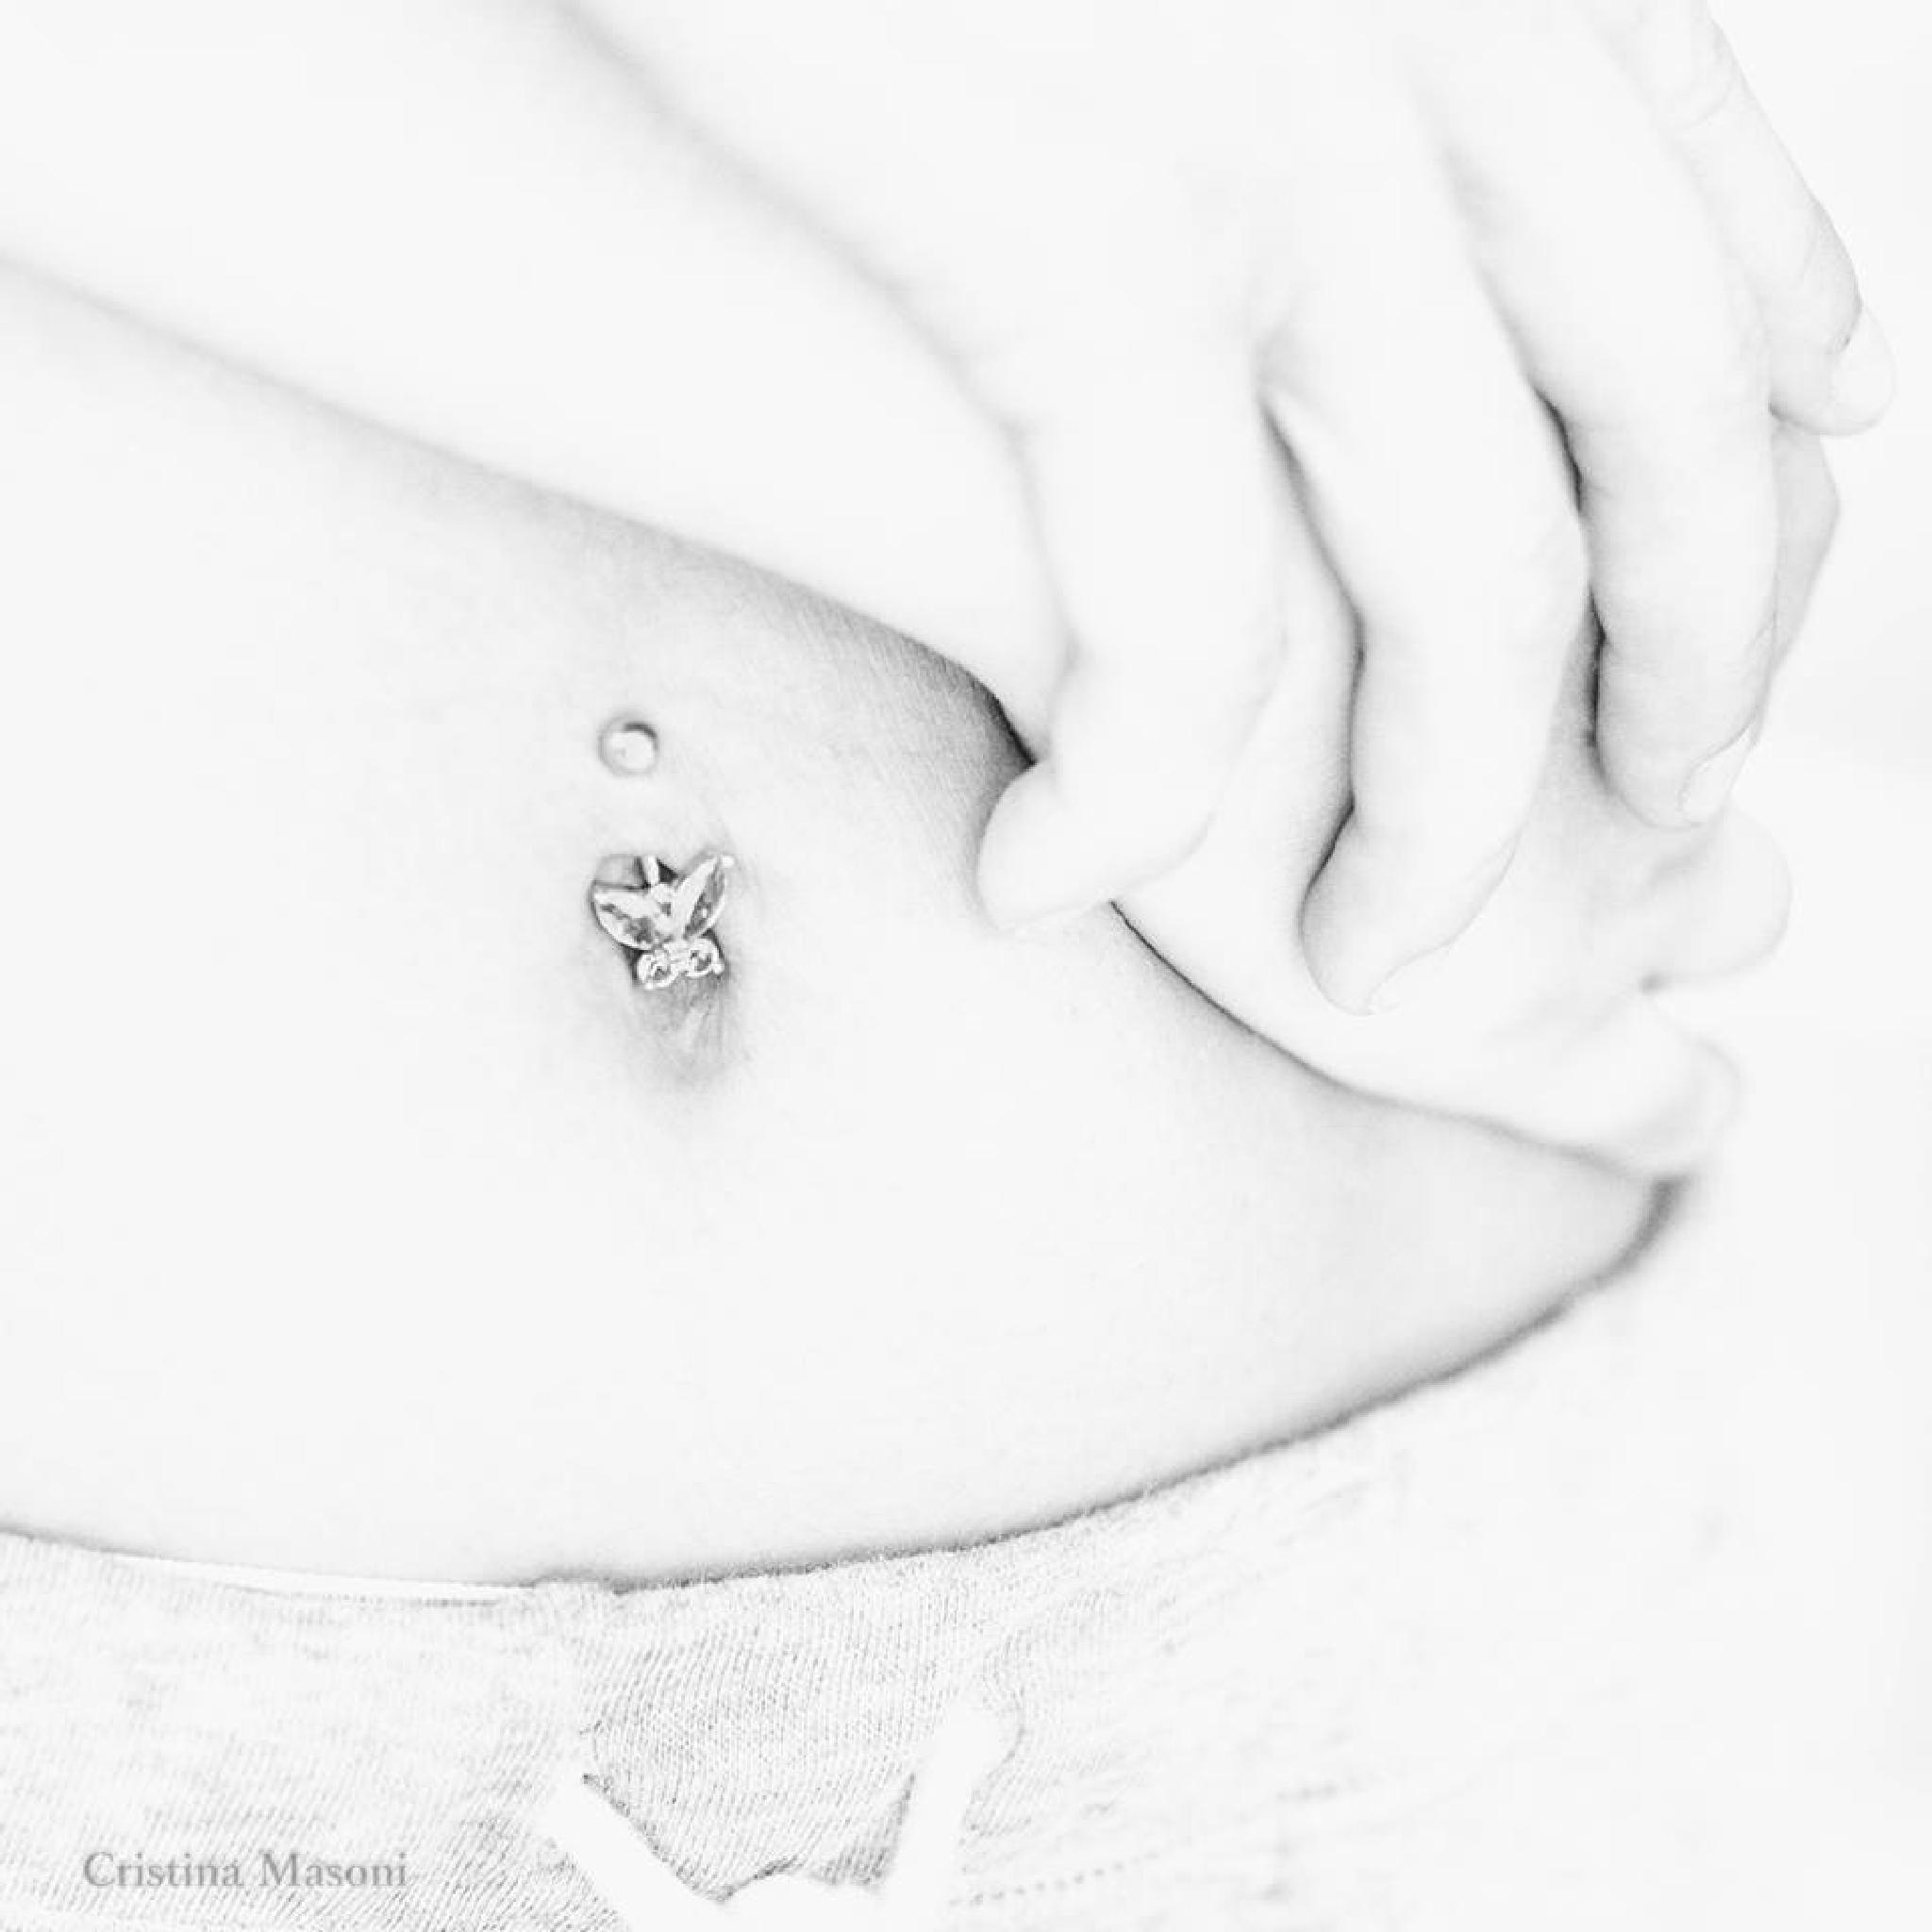 I hug you by Cristina Masoni